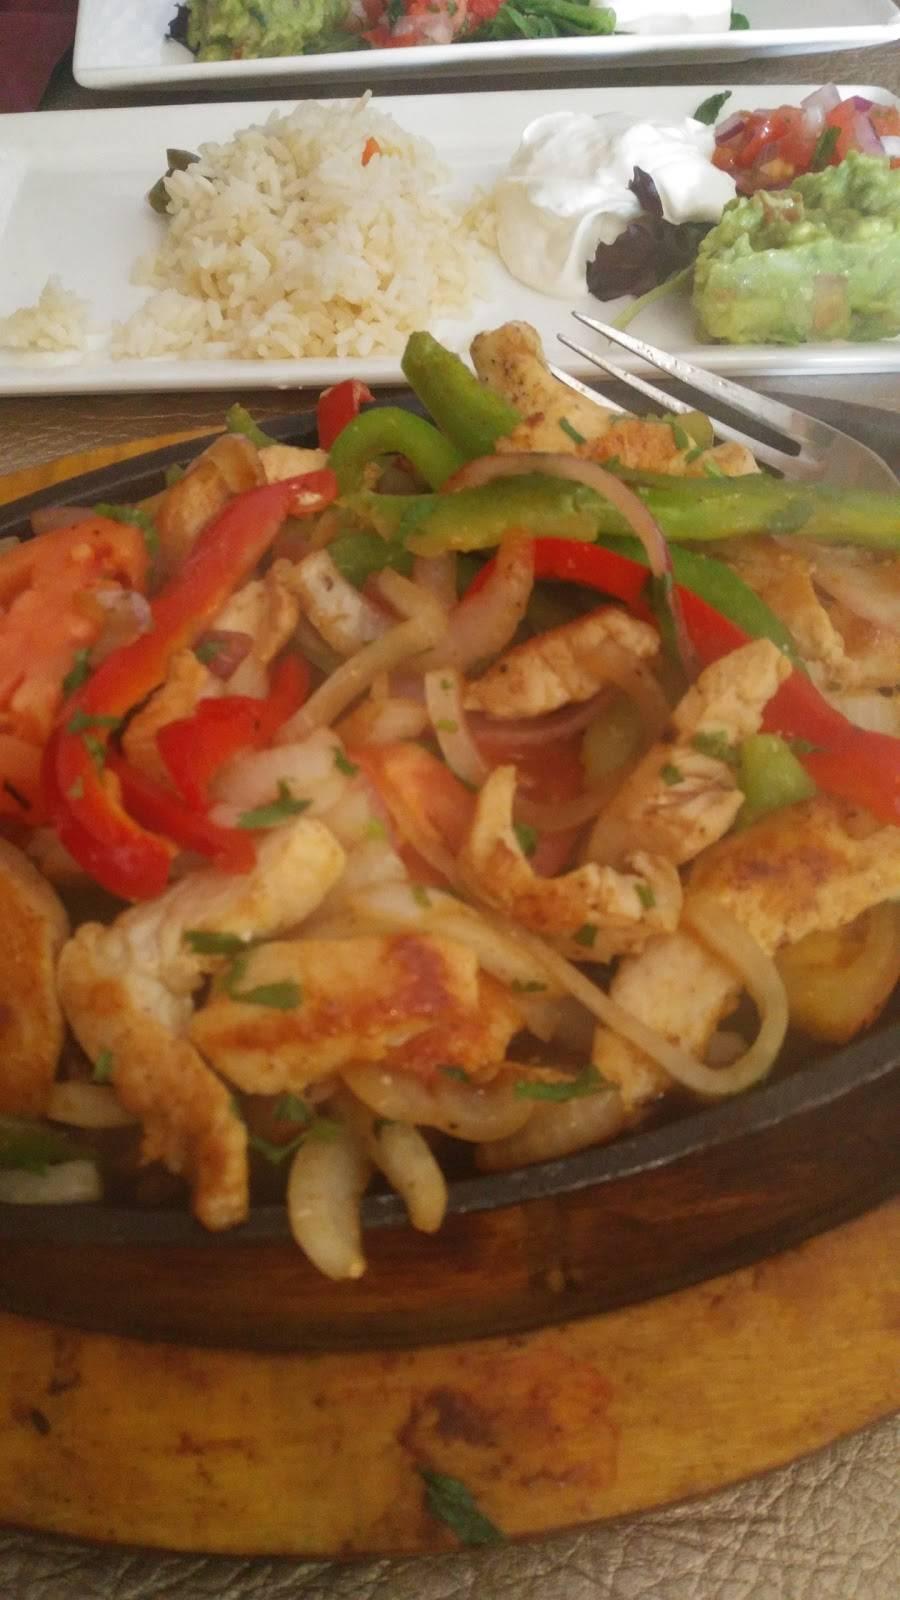 El Paraiso Restaurant - restaurant  | Photo 9 of 10 | Address: 6515 New Hampshire Ave, Takoma Park, MD 20912, USA | Phone: (301) 270-1190